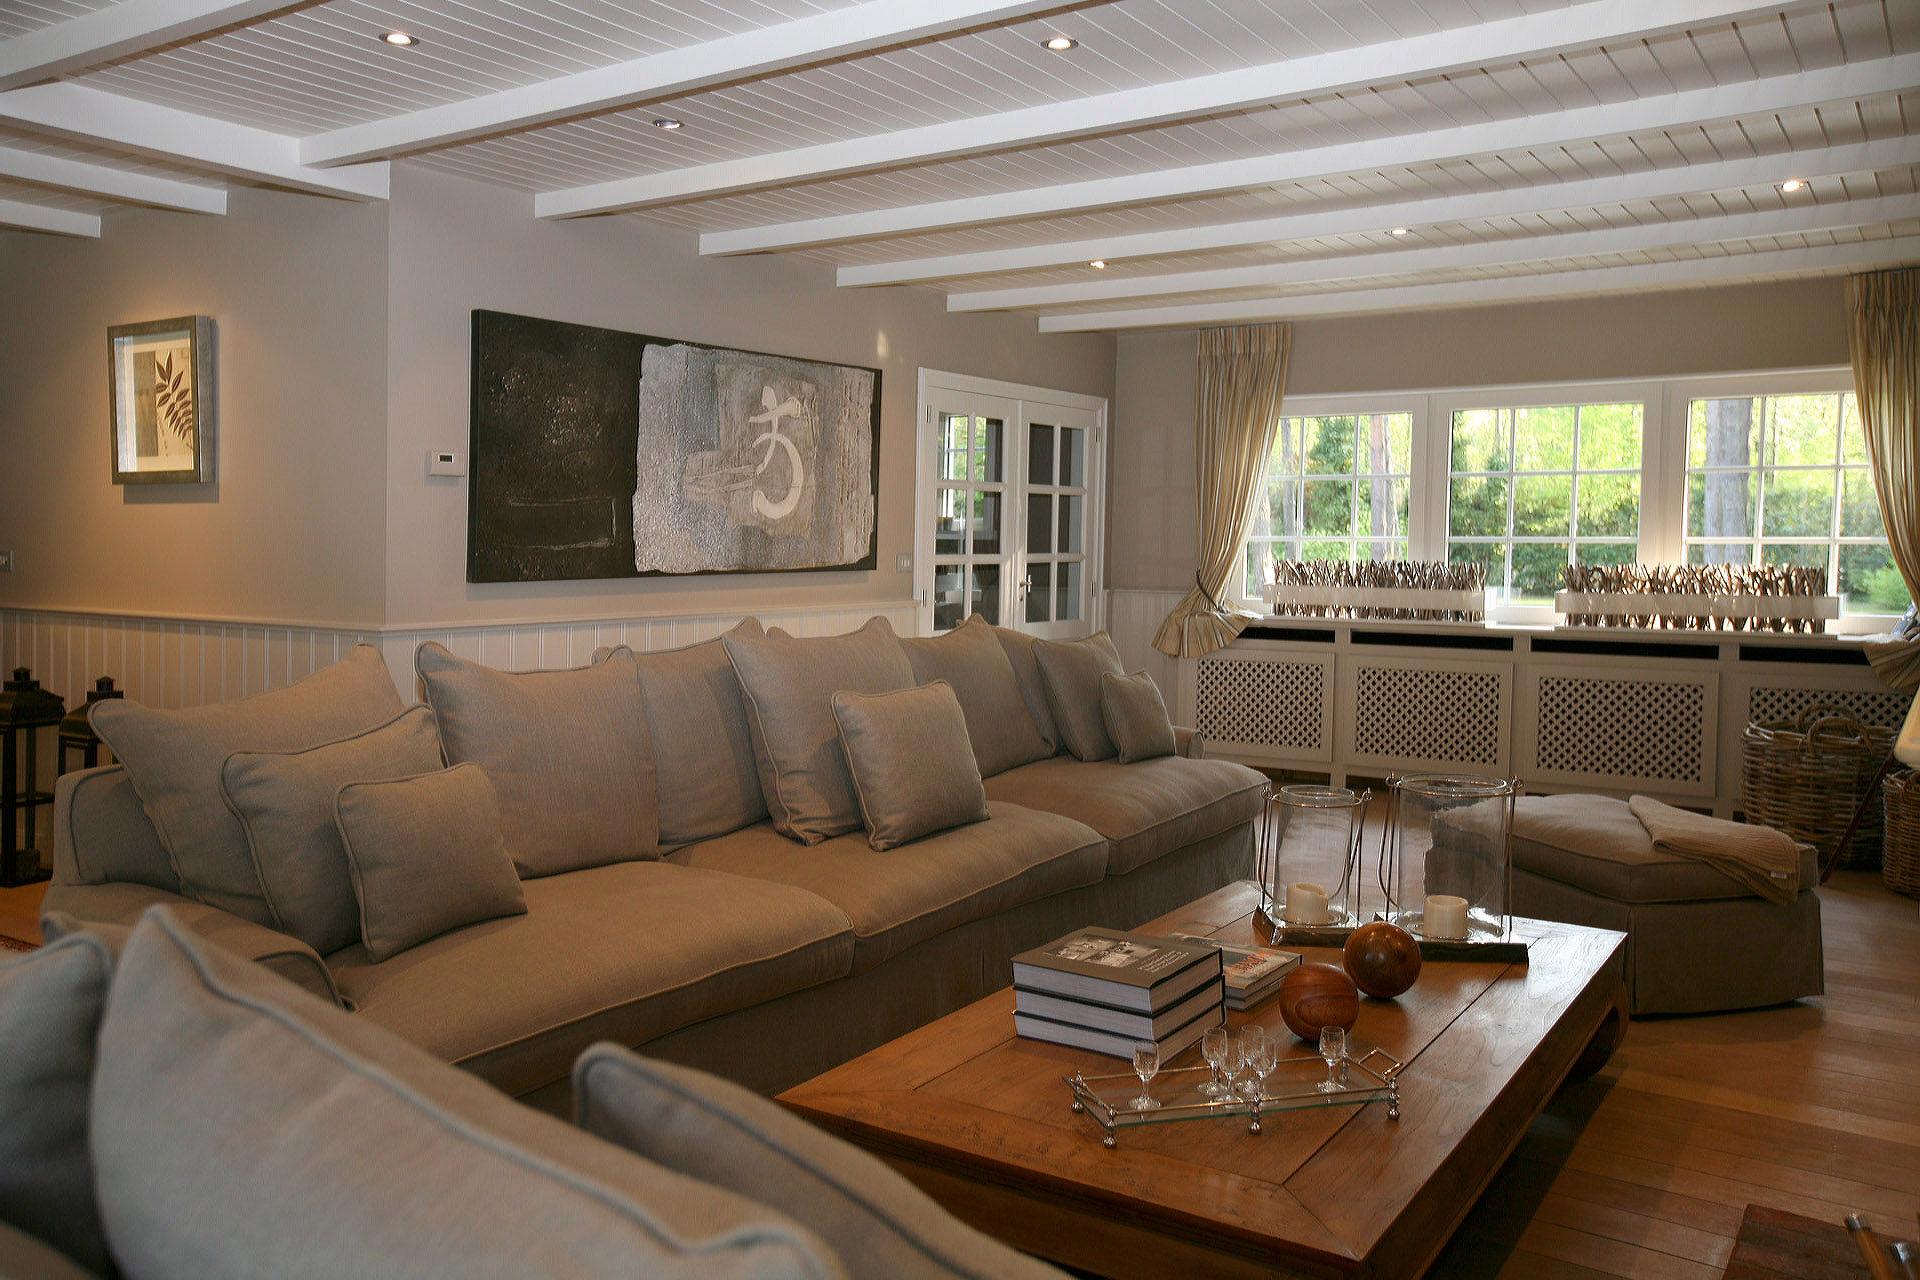 Landelijke Woonkamers Marcotte Style – Huis Design Interieur